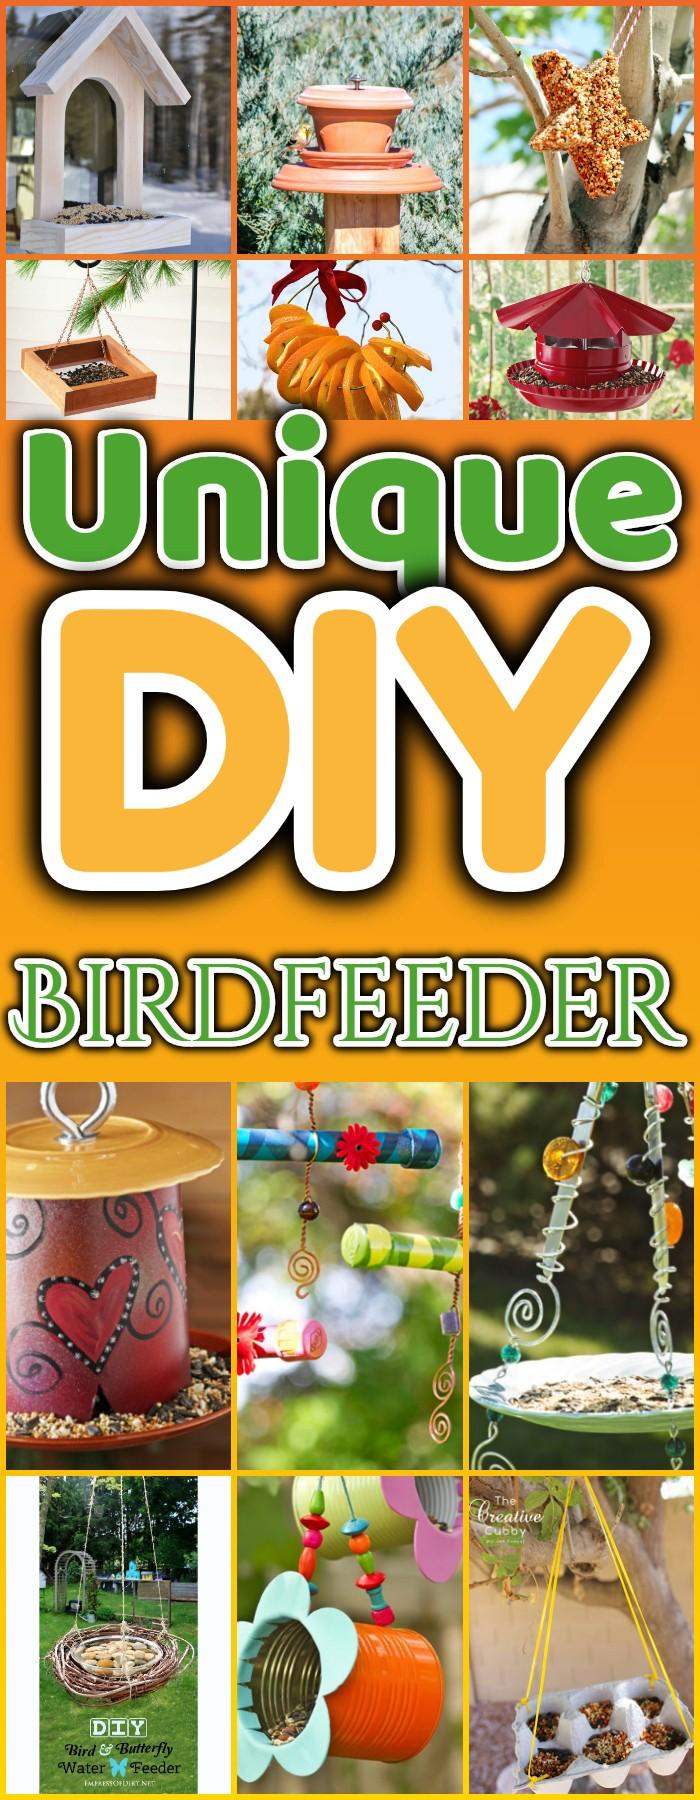 DIY Birdfeeder